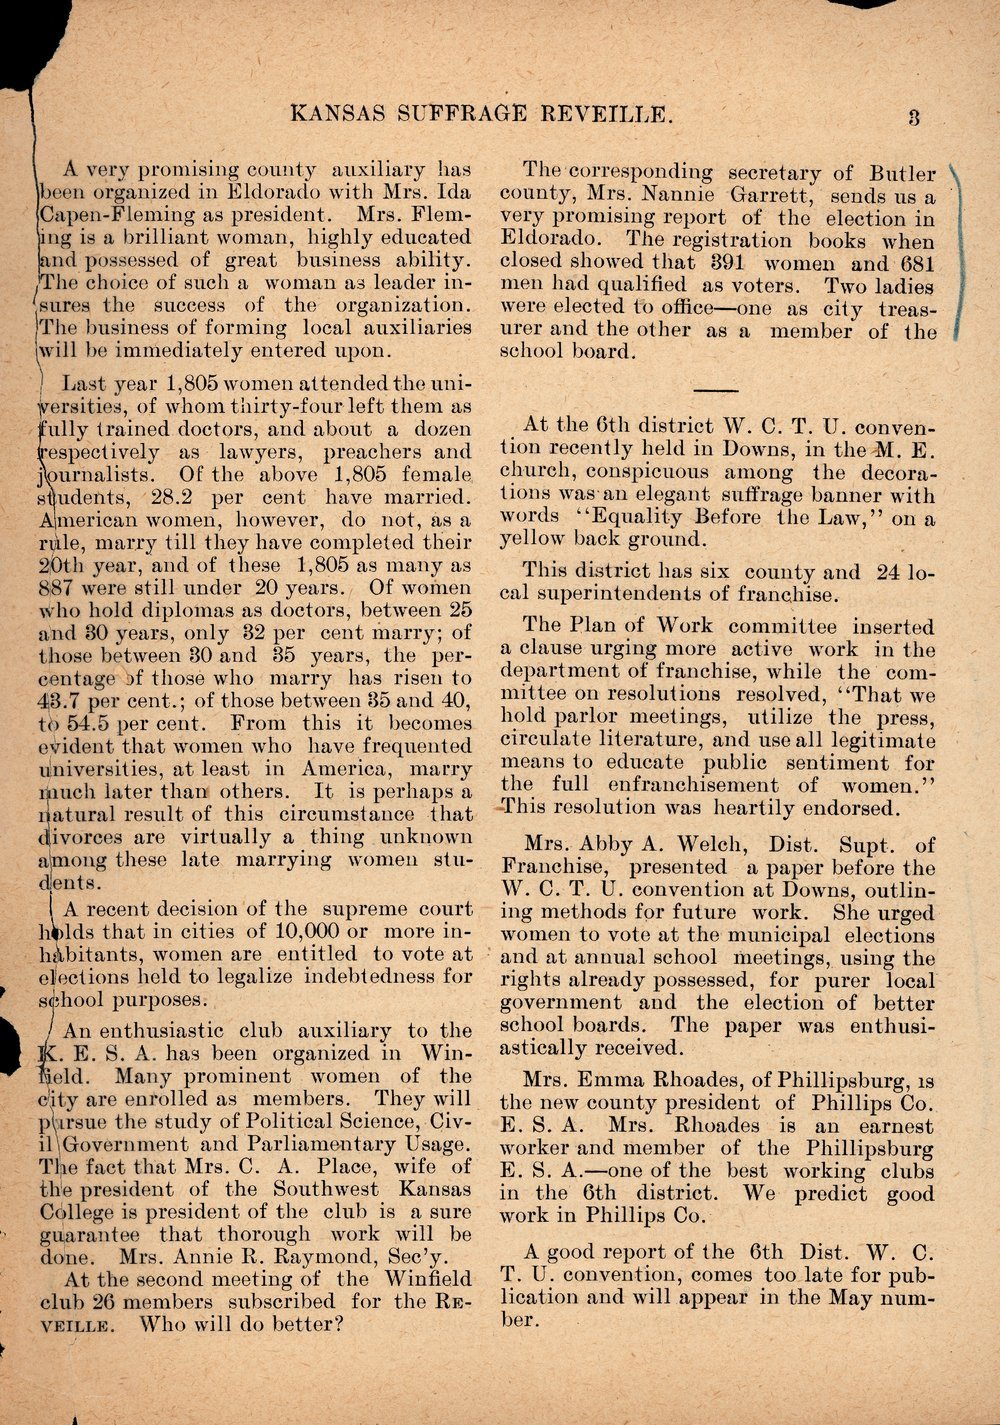 Kansas Suffrage Reveille: organ of the Kansas Equal Suffrage Association - 3